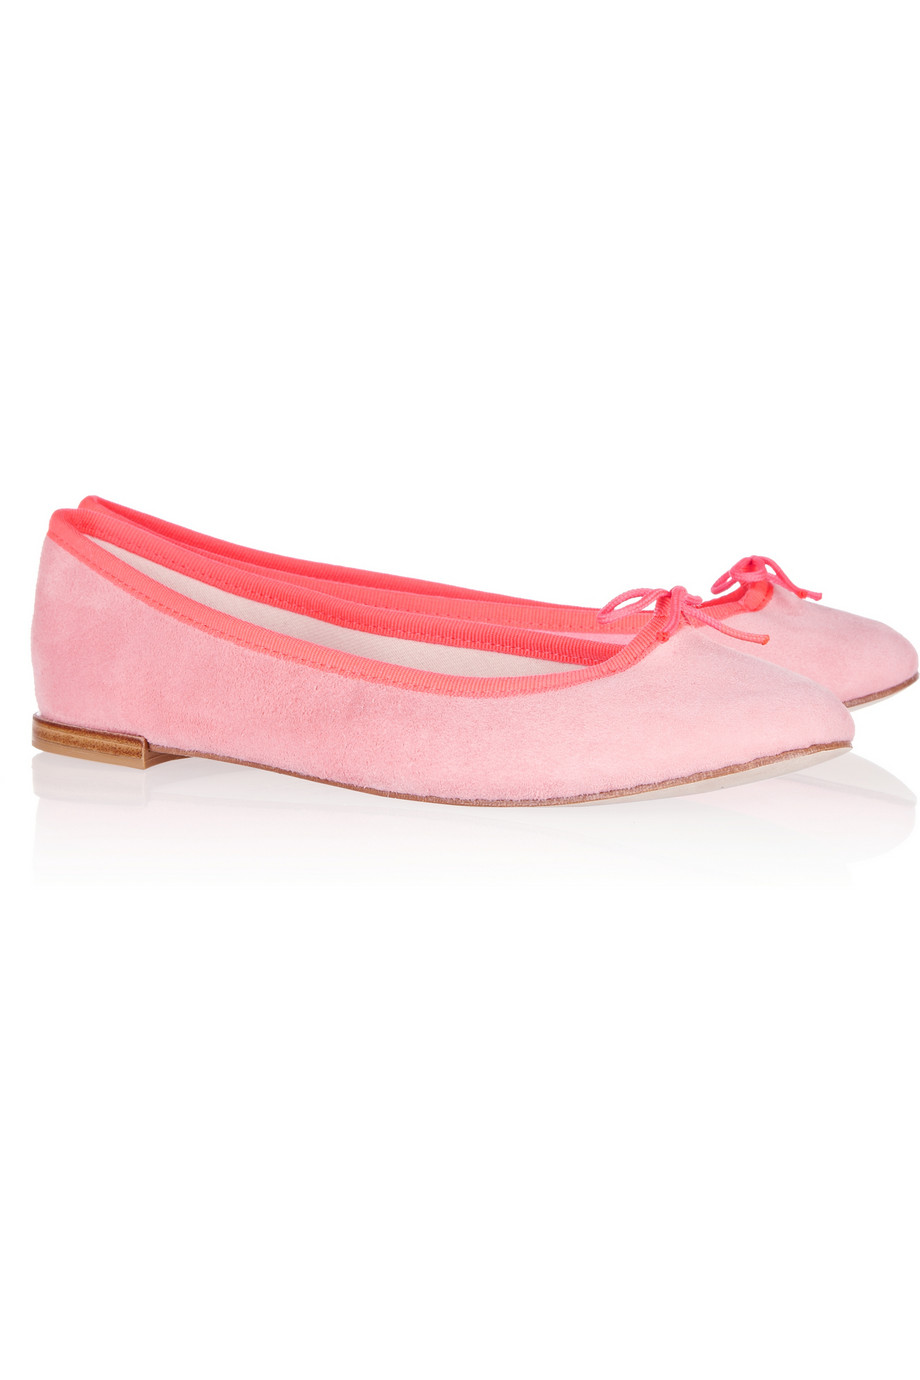 Pink Ballet Flats Womens Shoes